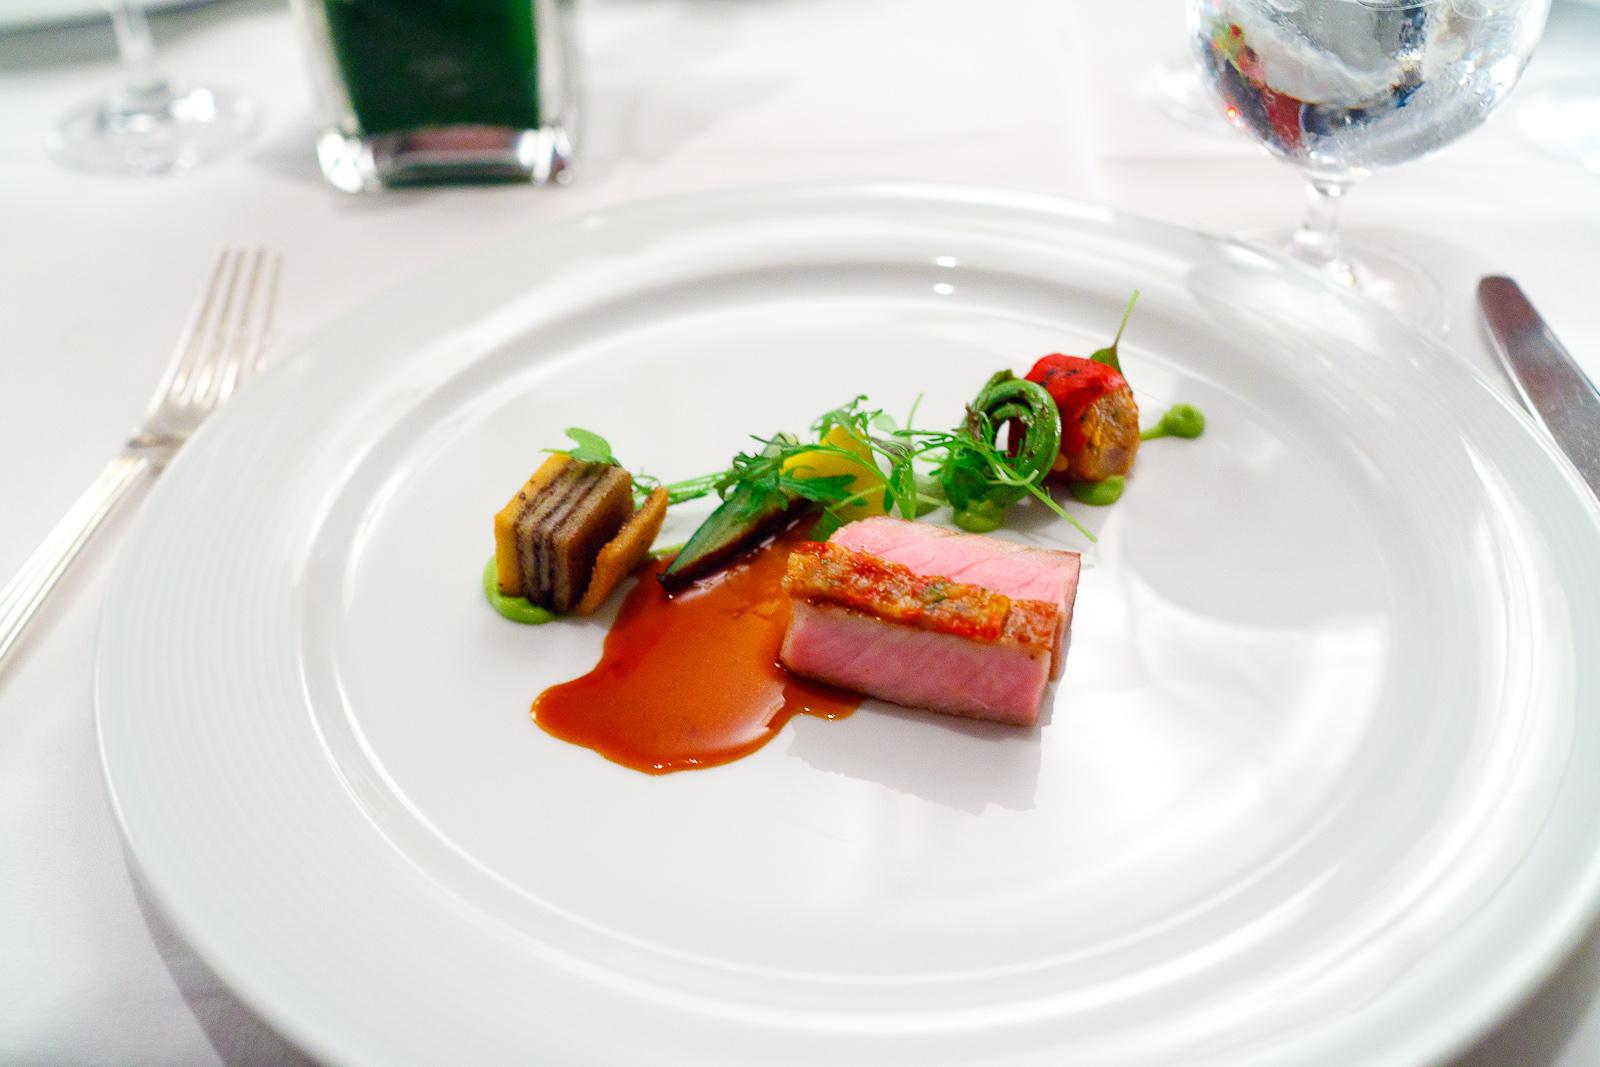 5th Course: Pork loin, chorizo, masa